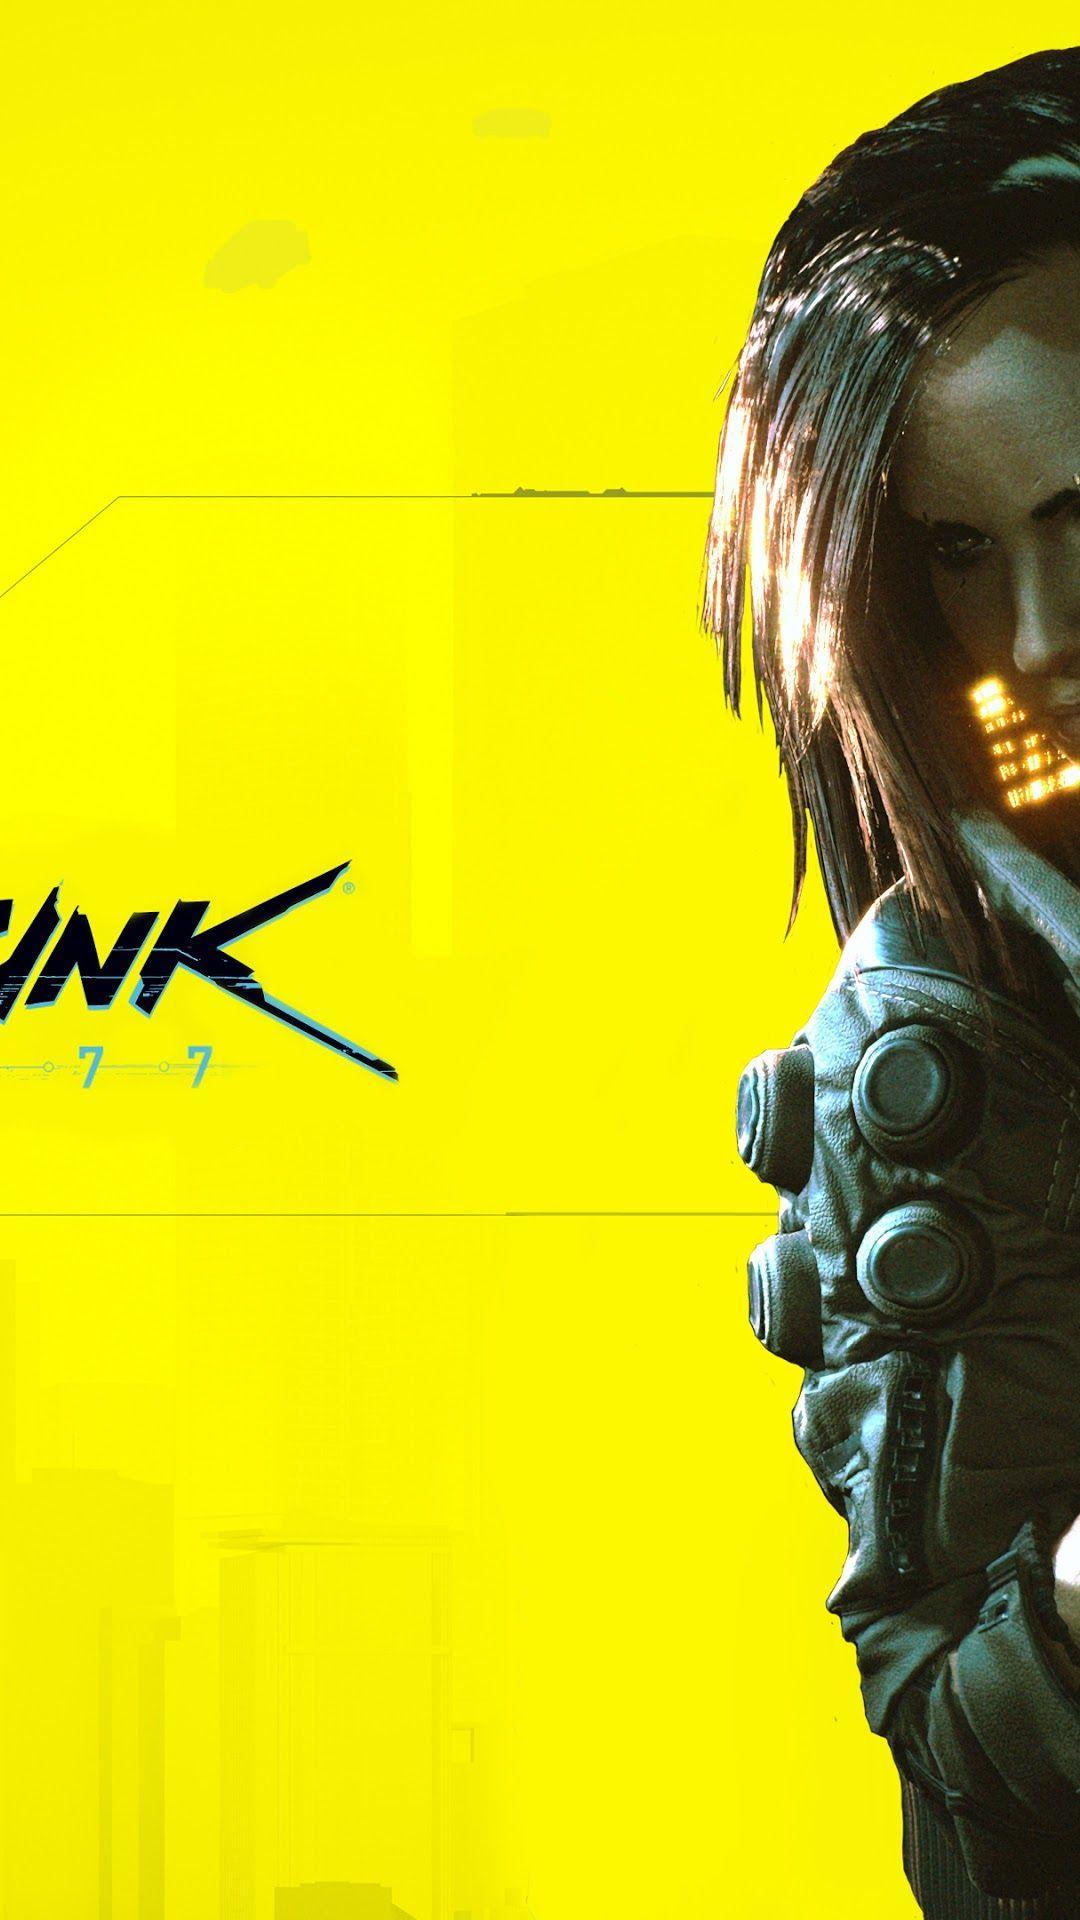 Cyberpunk 2077 Wallpaper 1920X1080 Yellow : Cyberpunk 2077 ...